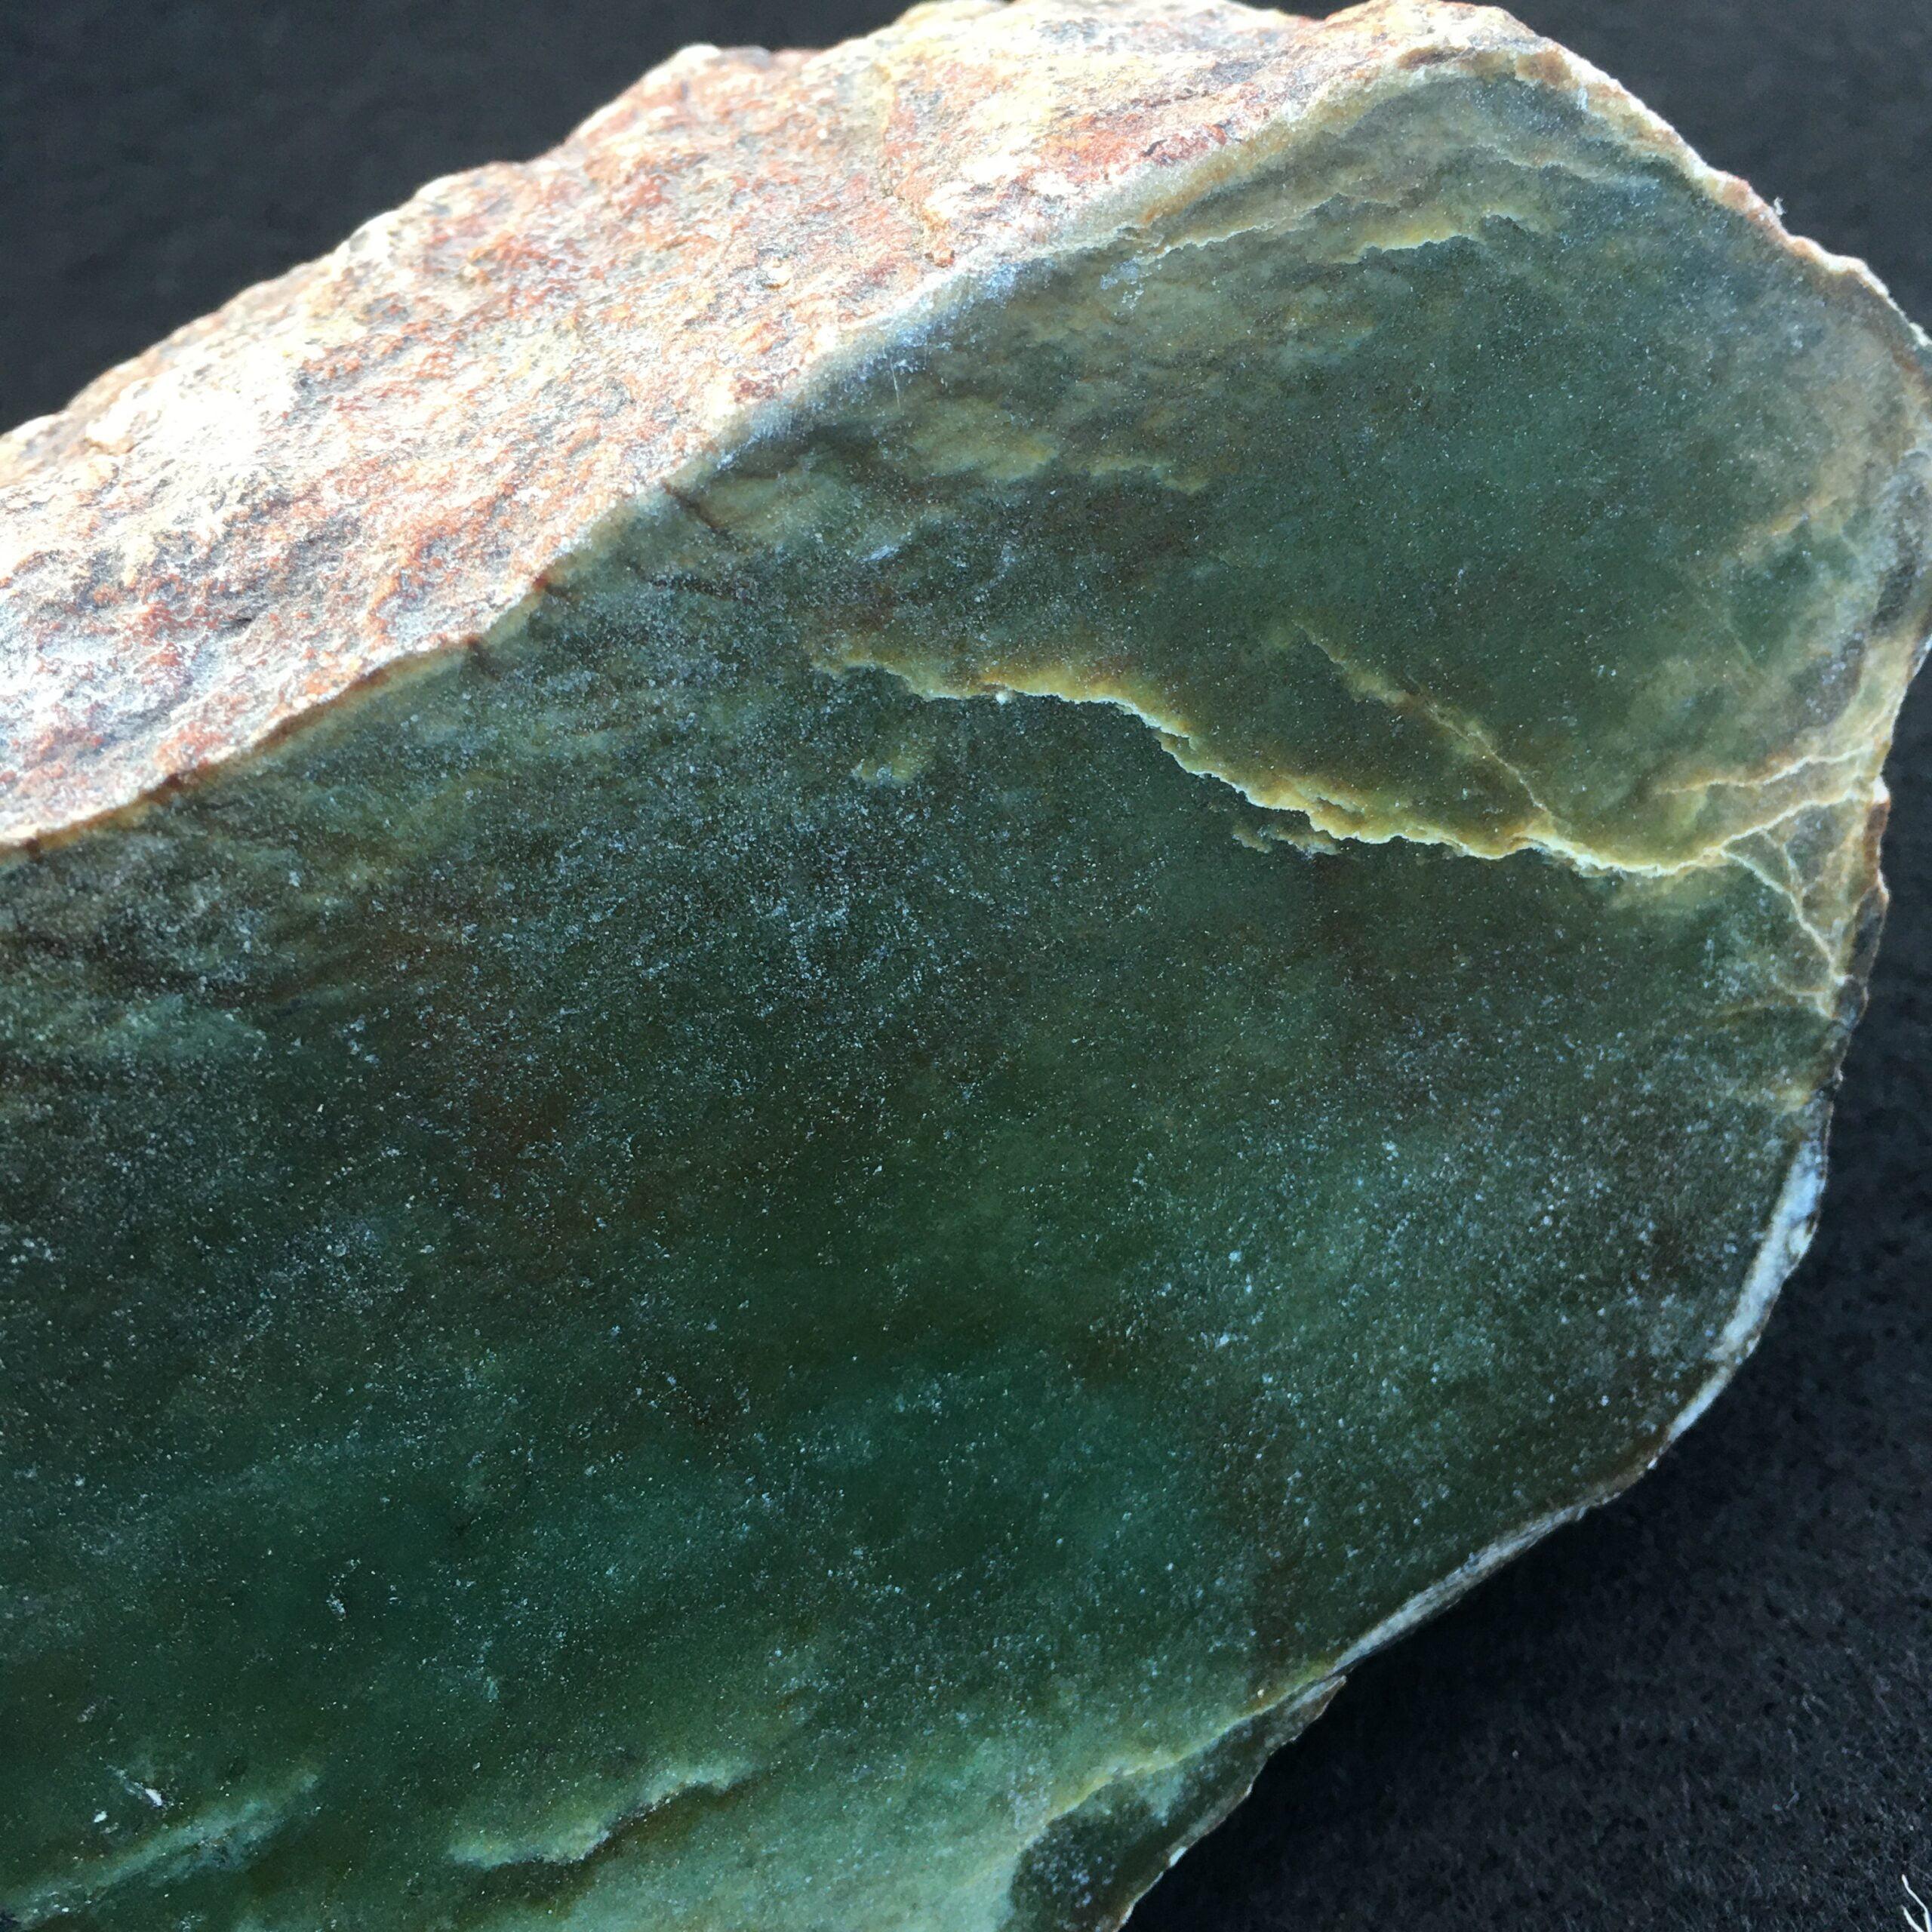 #J5 Wyoming Jade 1/2 Natural Boulder Display Specimen